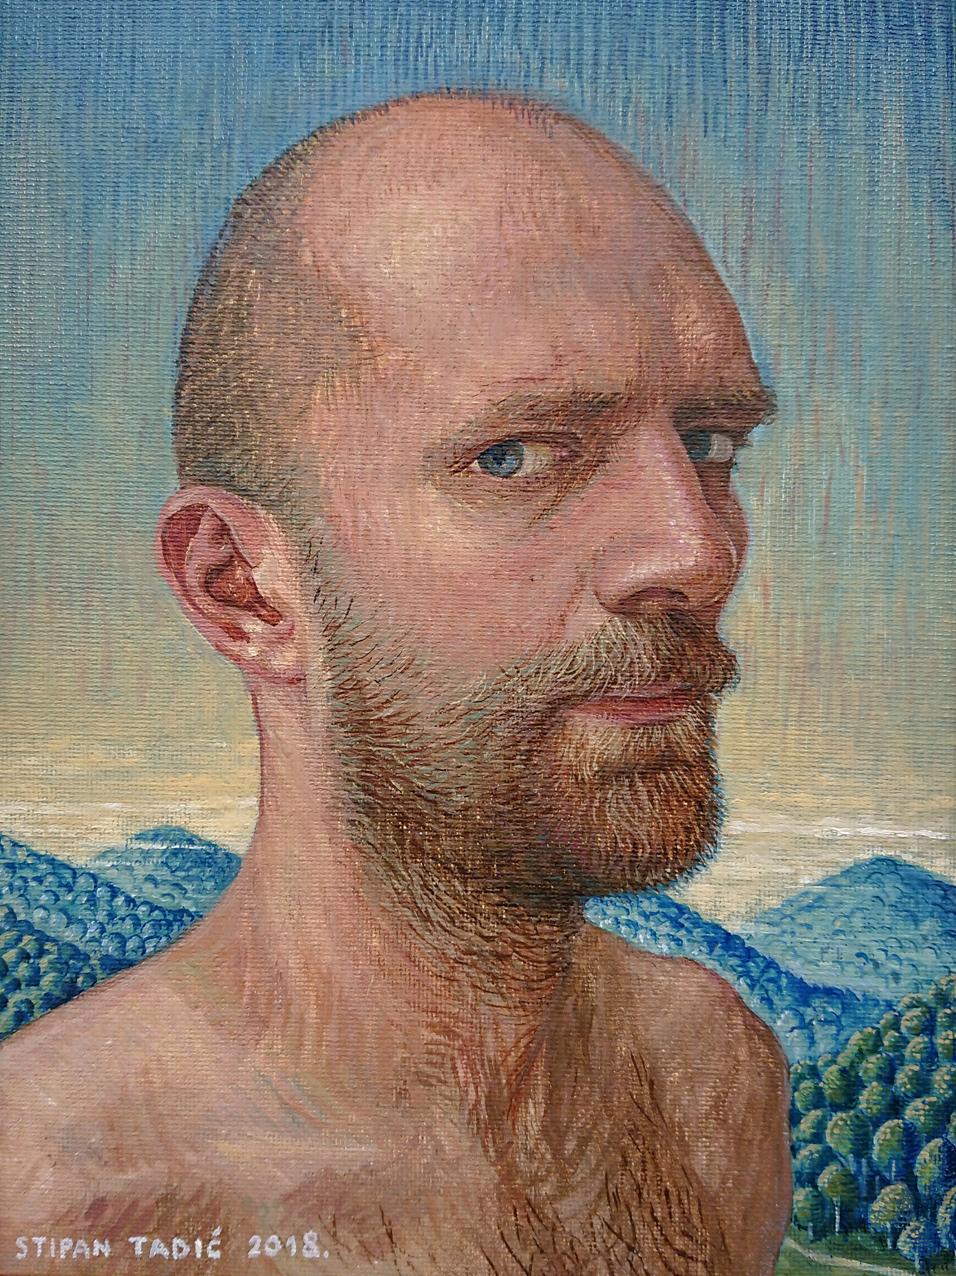 Stipan Tadić,portrait (artist #2), oil on canvas on wood, 24 x 18 cm